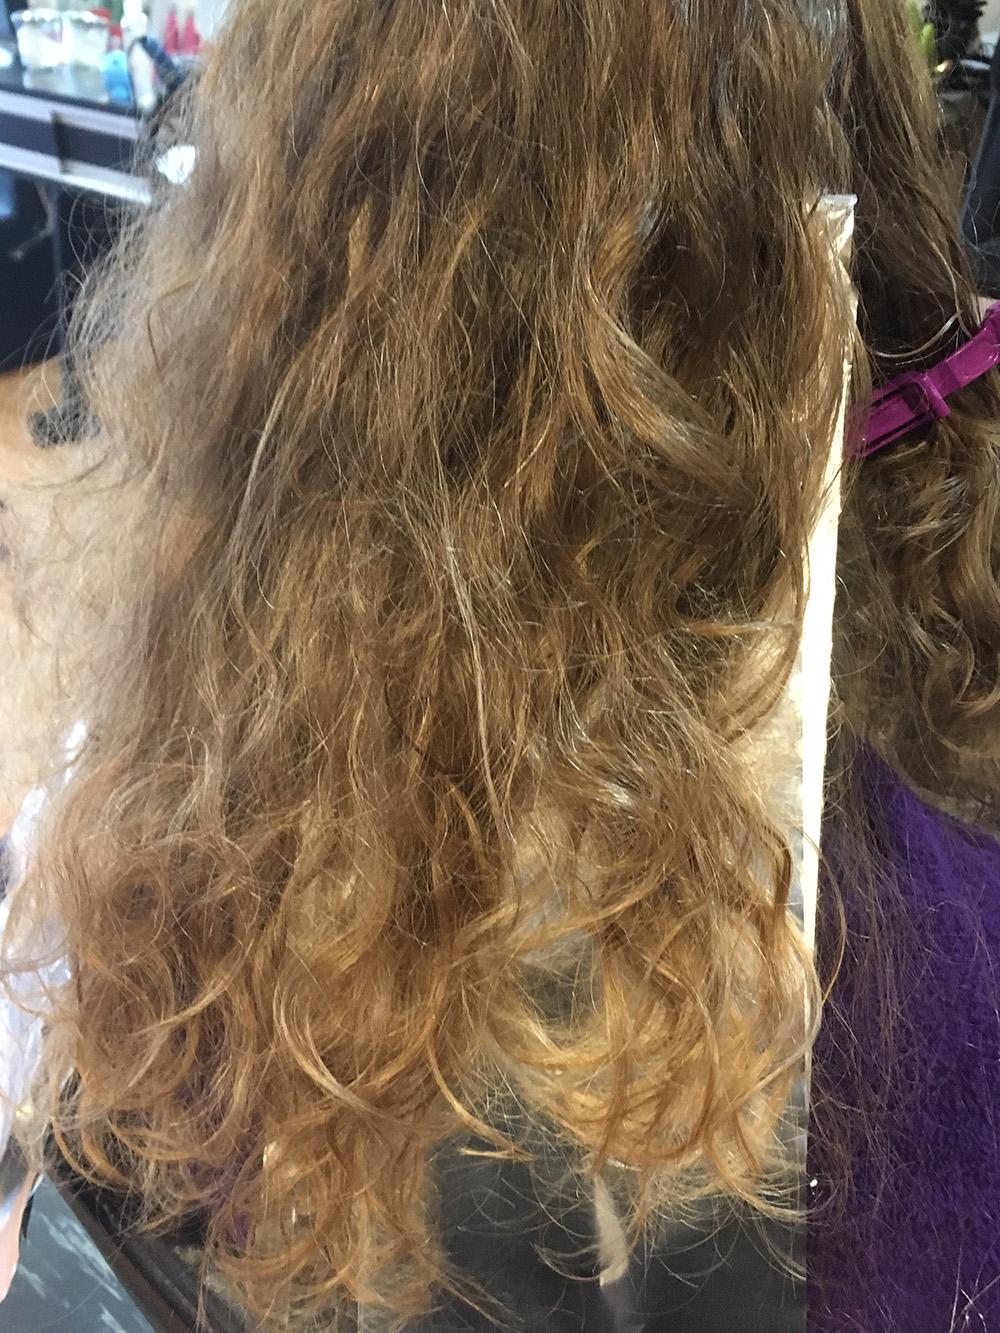 LJ Hair Design #Hairspiration | Hair Salon | Niagara Falls, NY